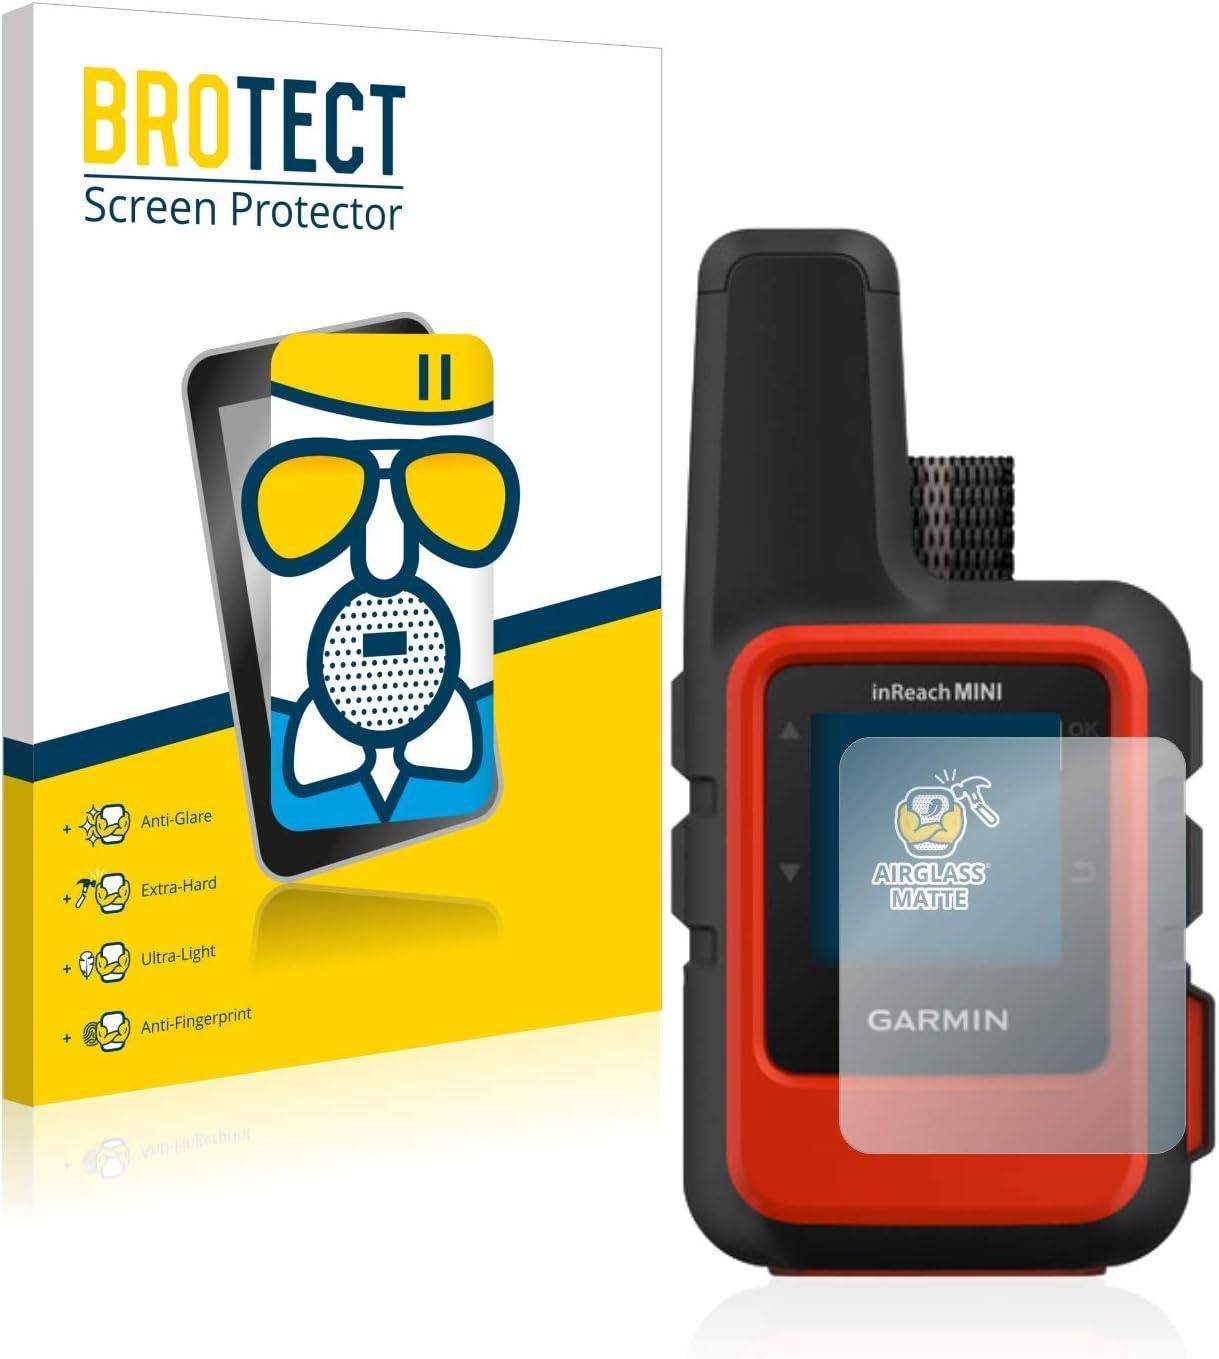 BROTECT Protector Pantalla Cristal Mate Compatible con Garmin inReach Mini Protector Pantalla Anti-Reflejos Vidrio, AirGlass